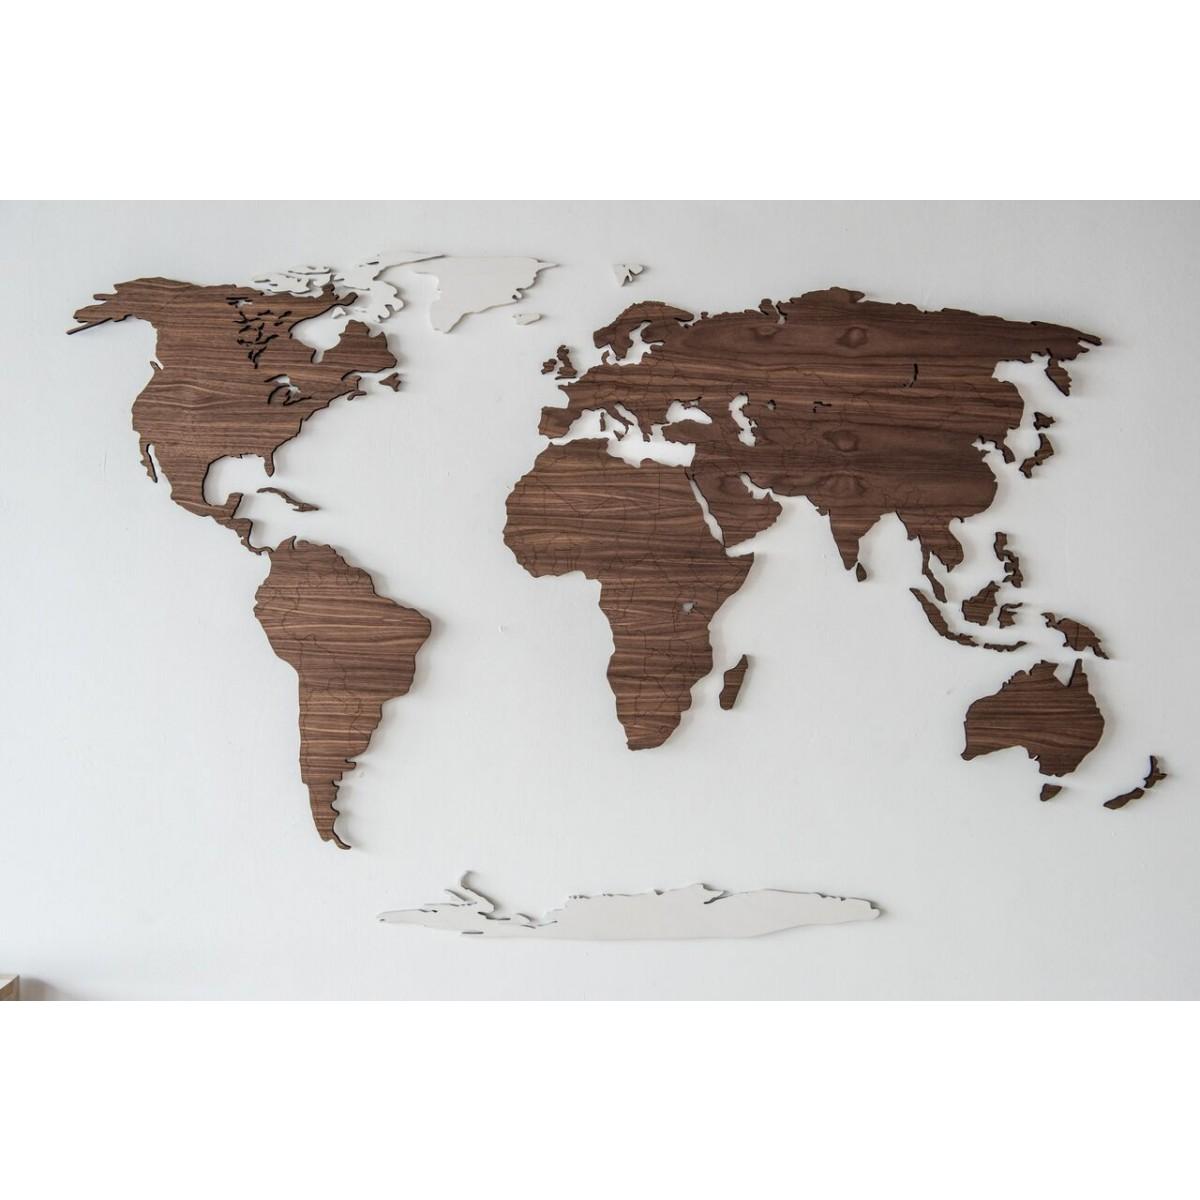 TERRA CASA -Weltkarte aus Holz